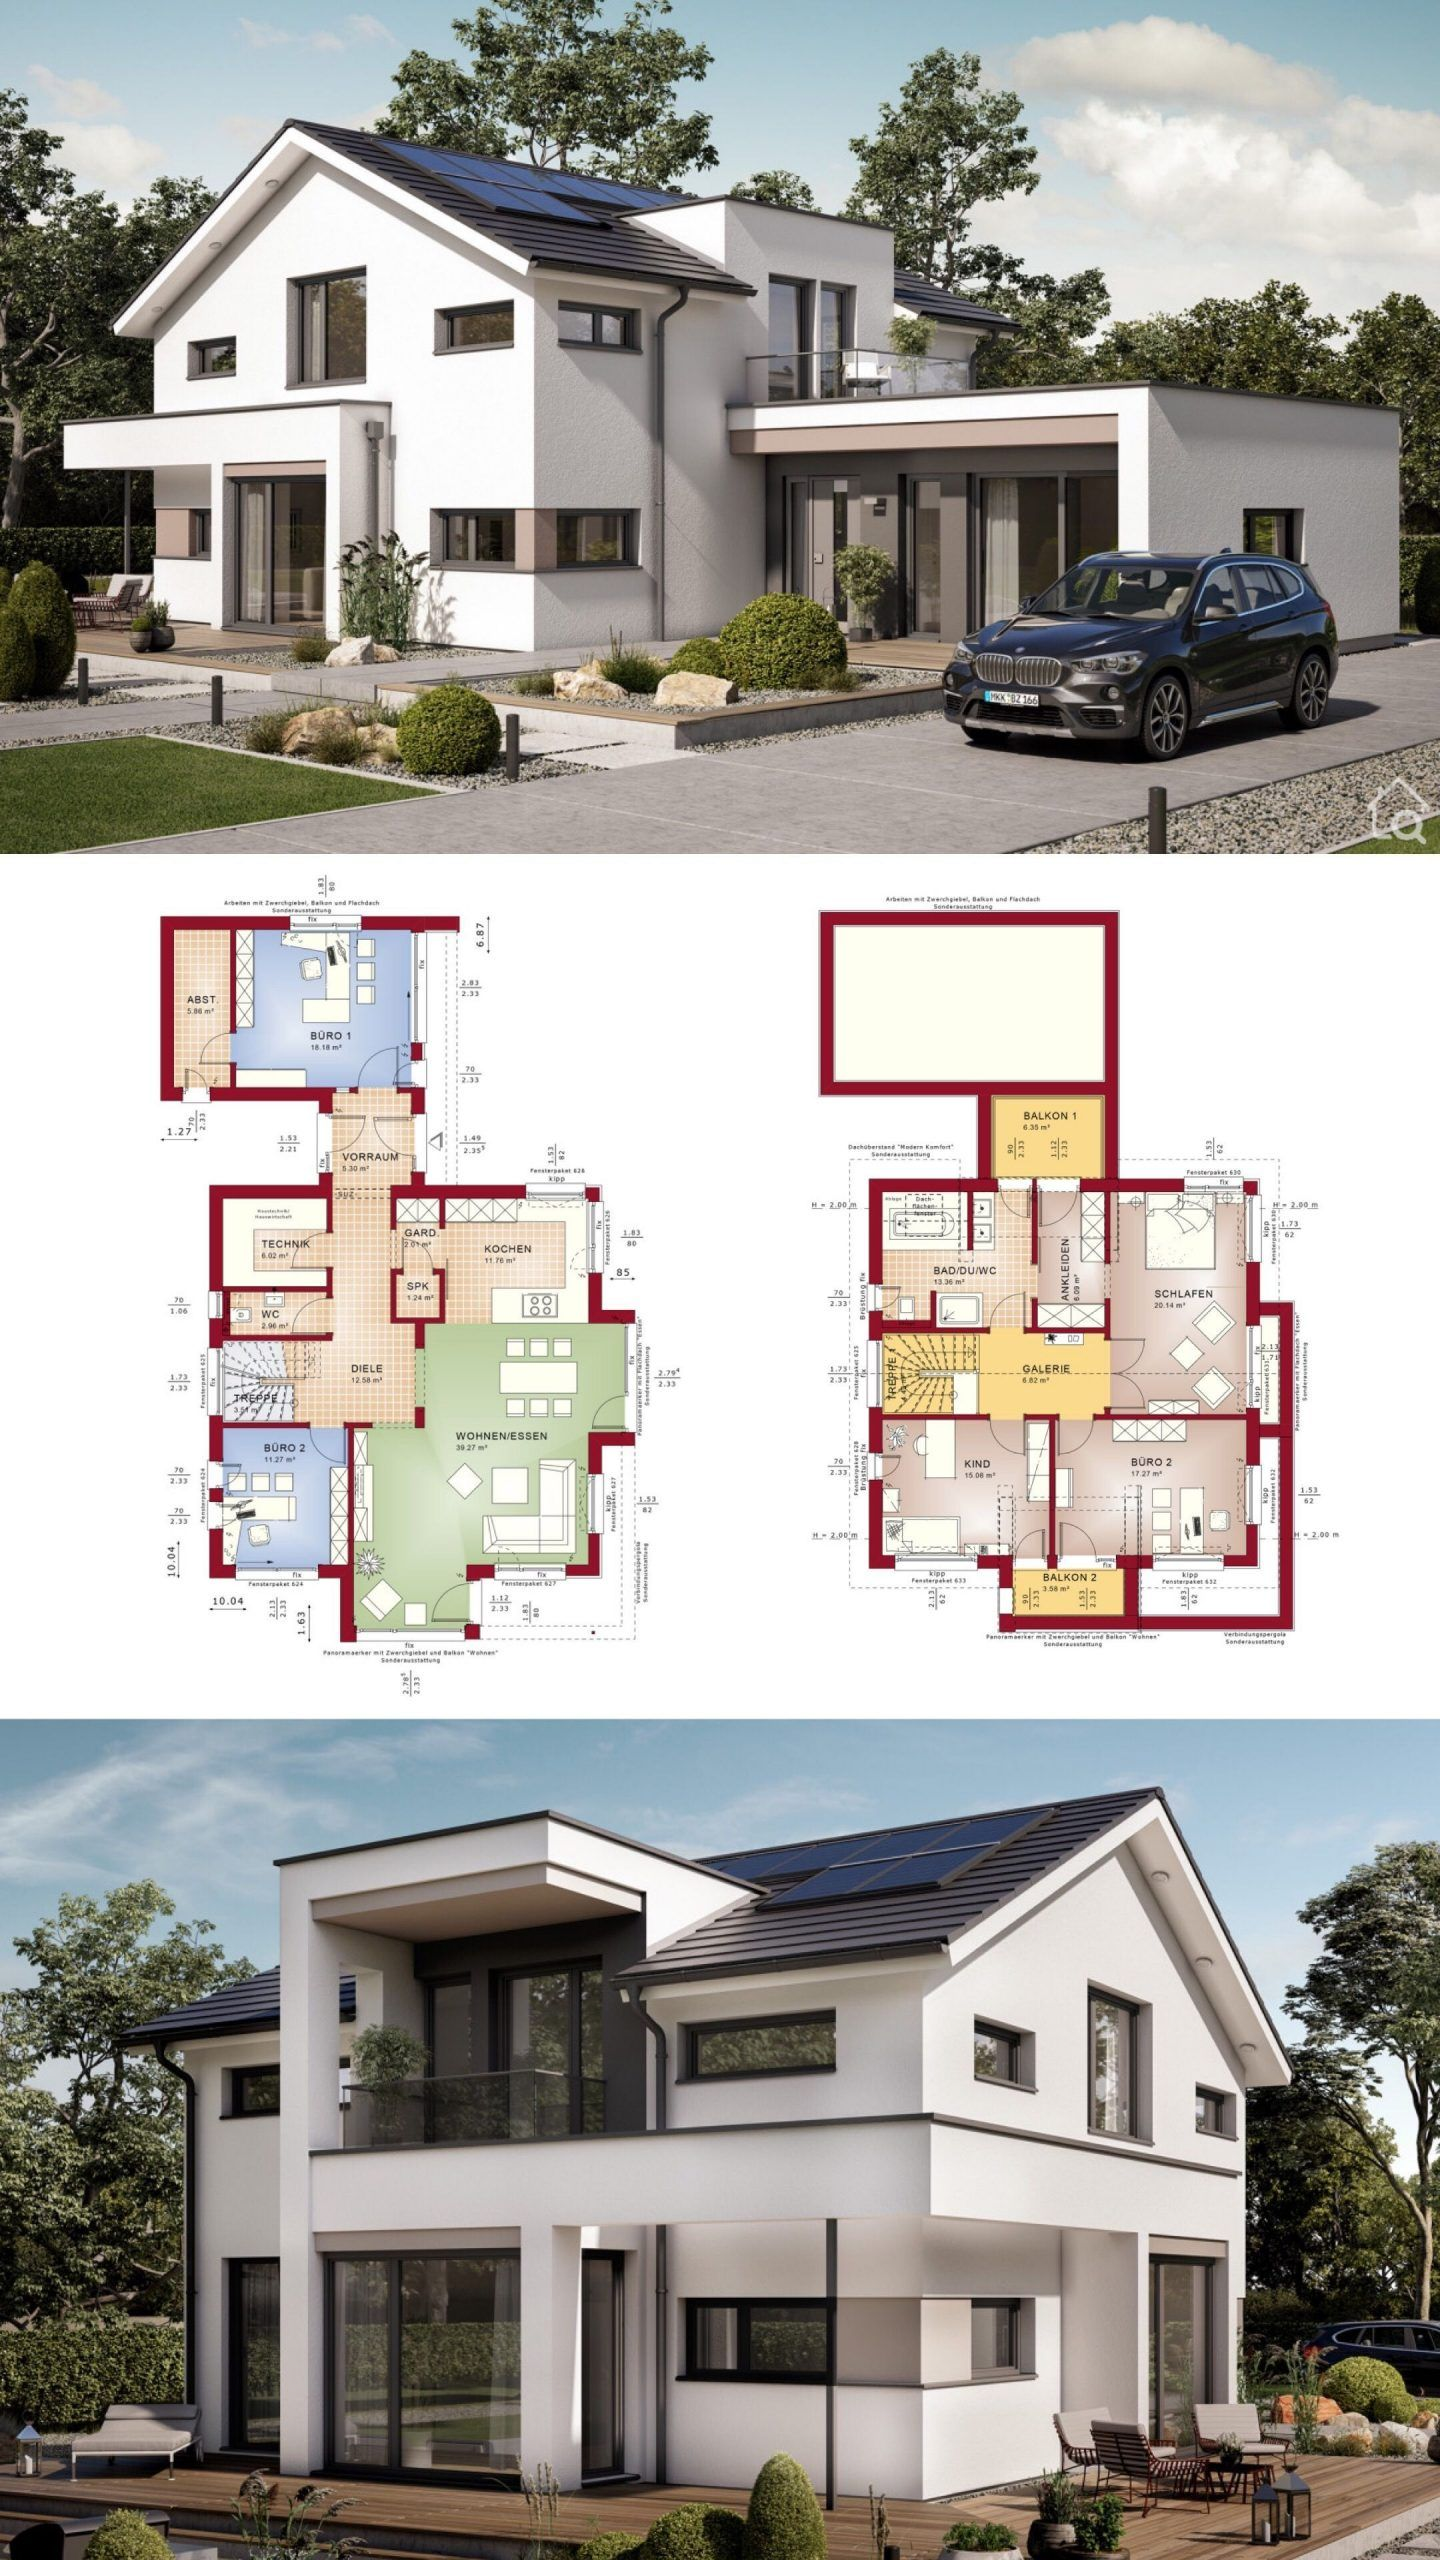 House Architecture Design Floor Plan With 2 Story Modern Architecture House Modern House Design Architecture Design